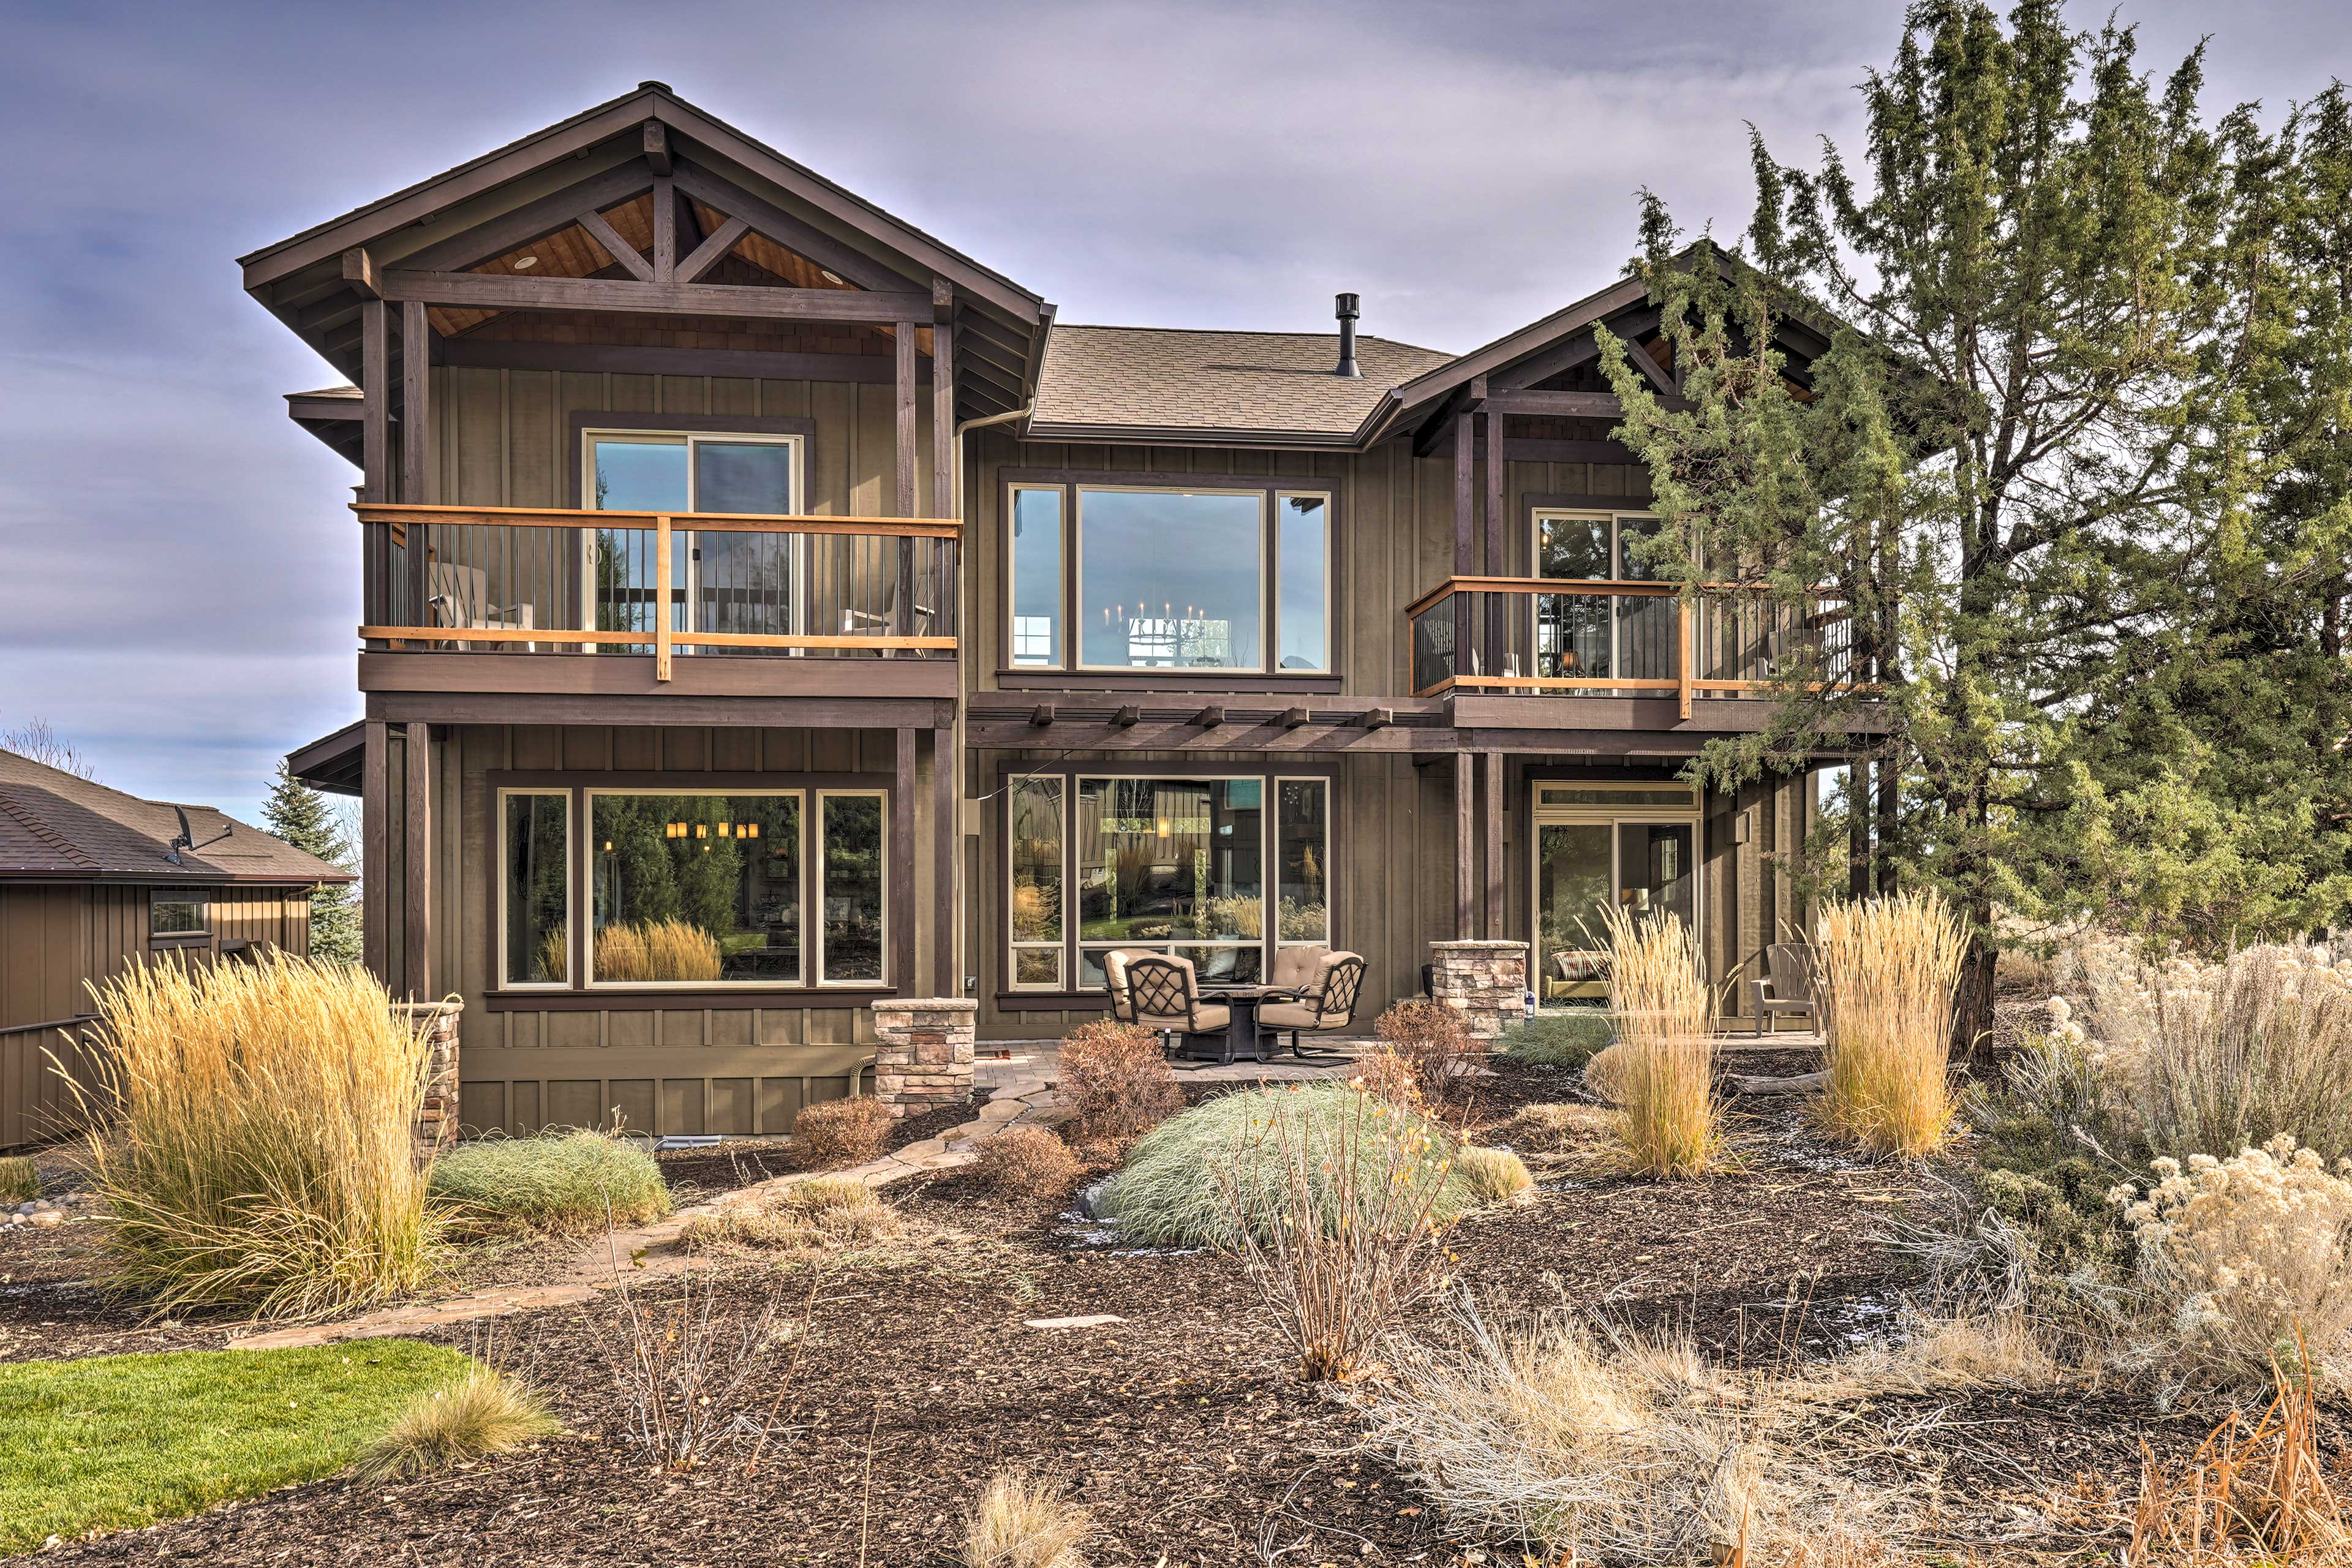 Redmond Vacation Rental | 4BR | 2.5BA | 2 Stories | 2,000 Sq Ft